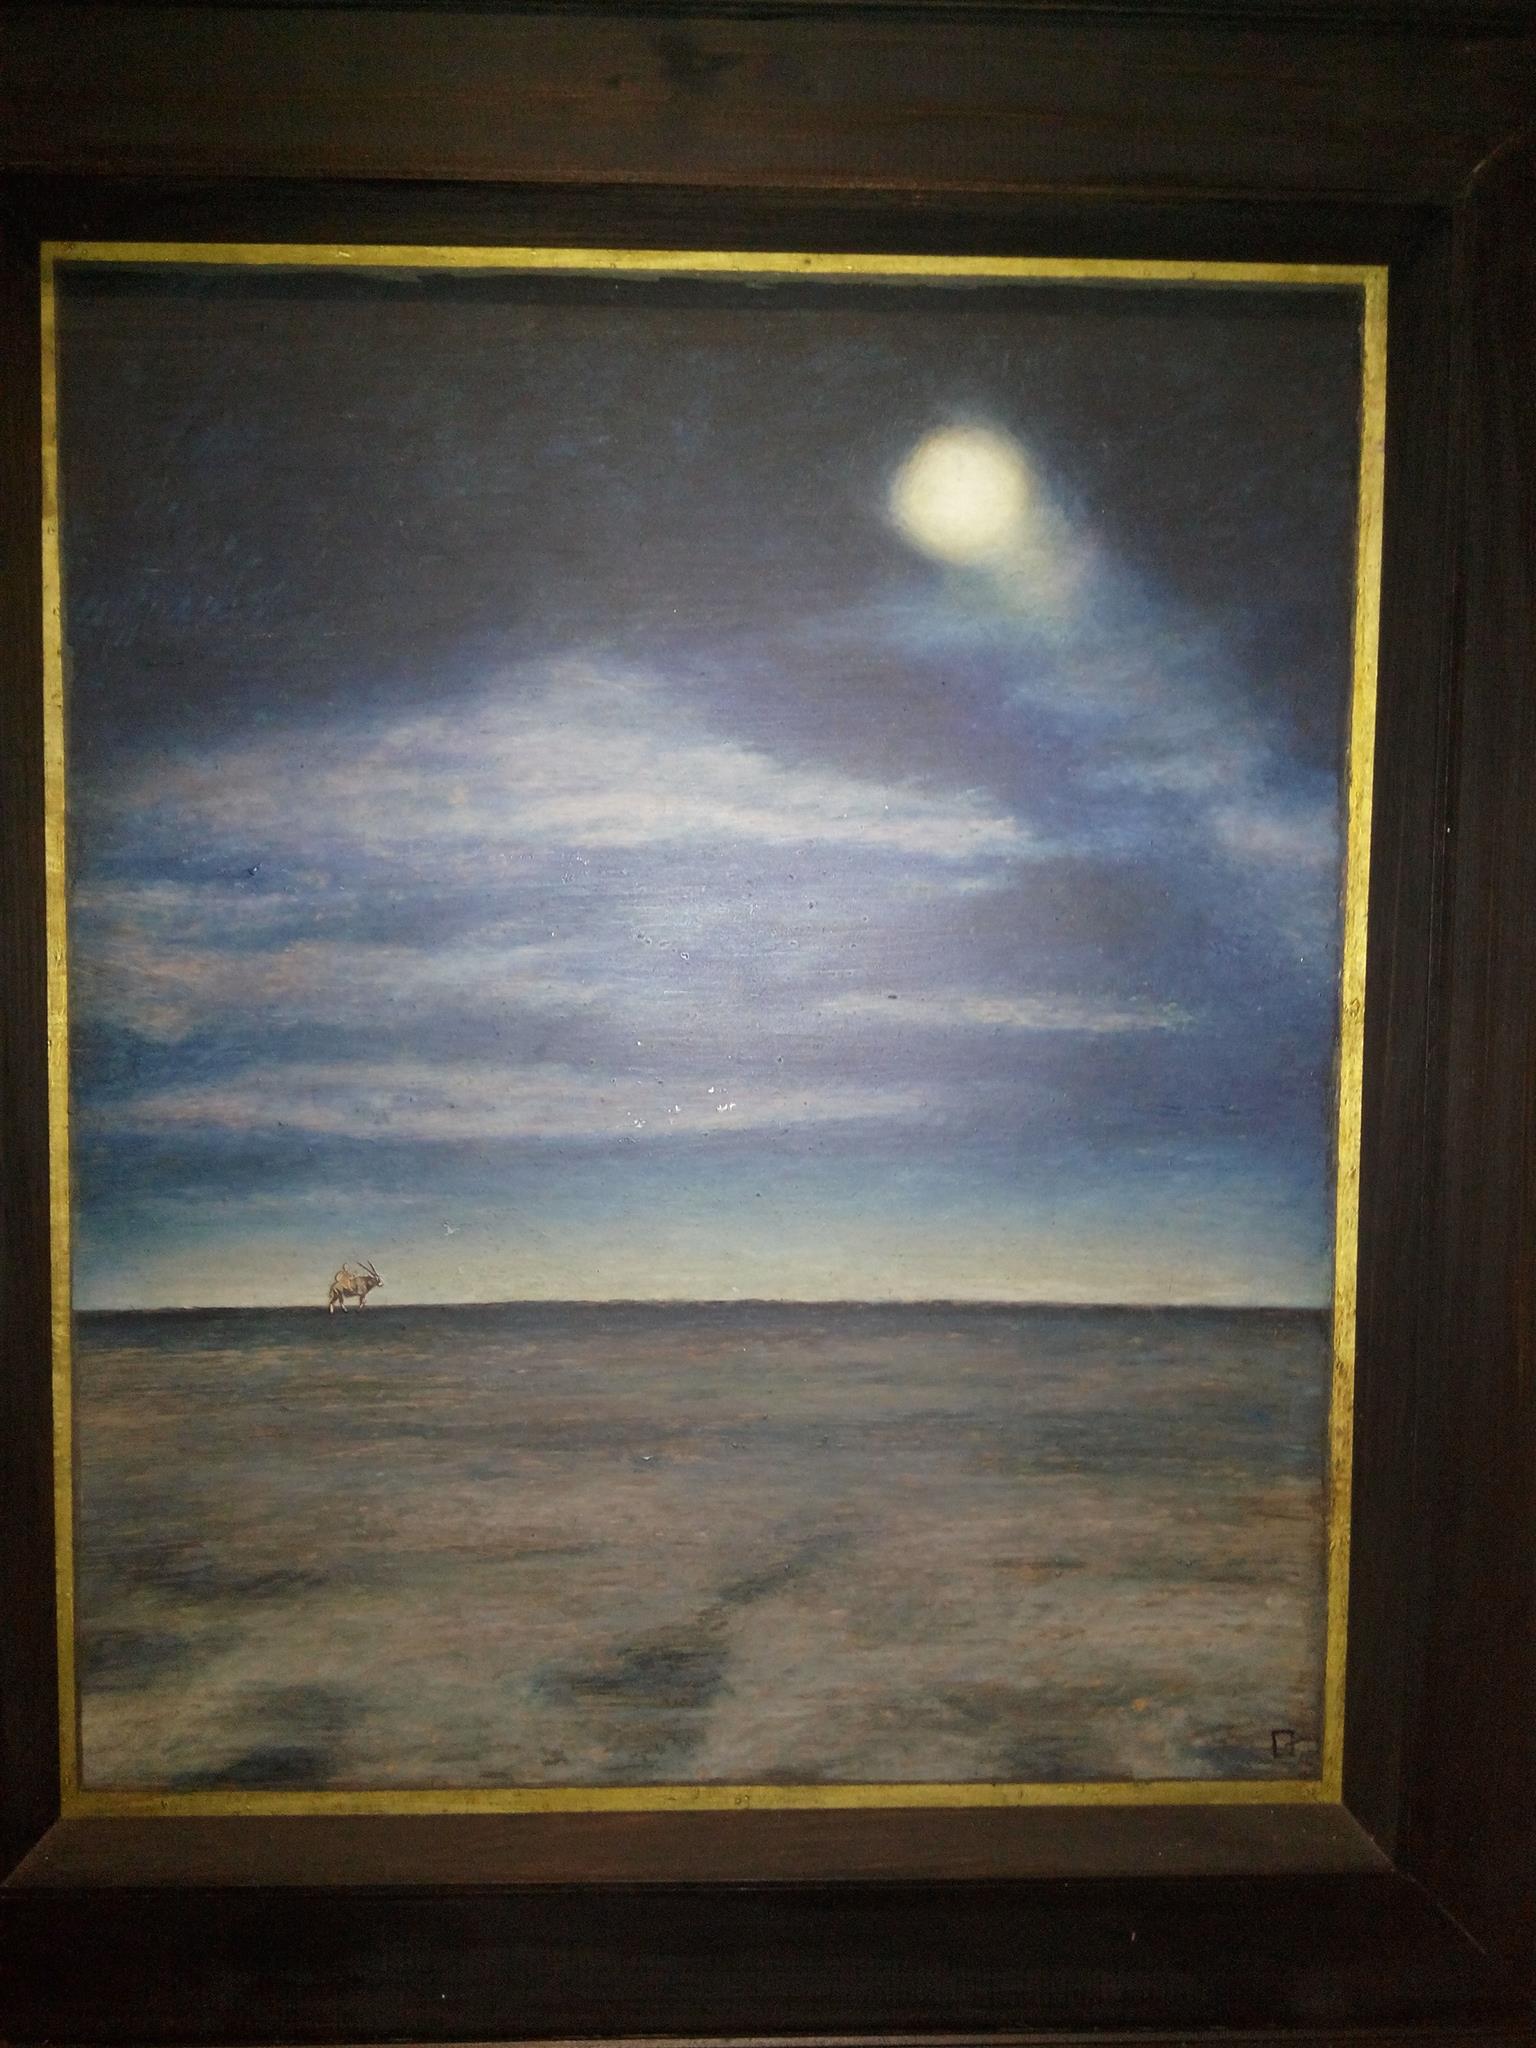 Liekie Fouche painting